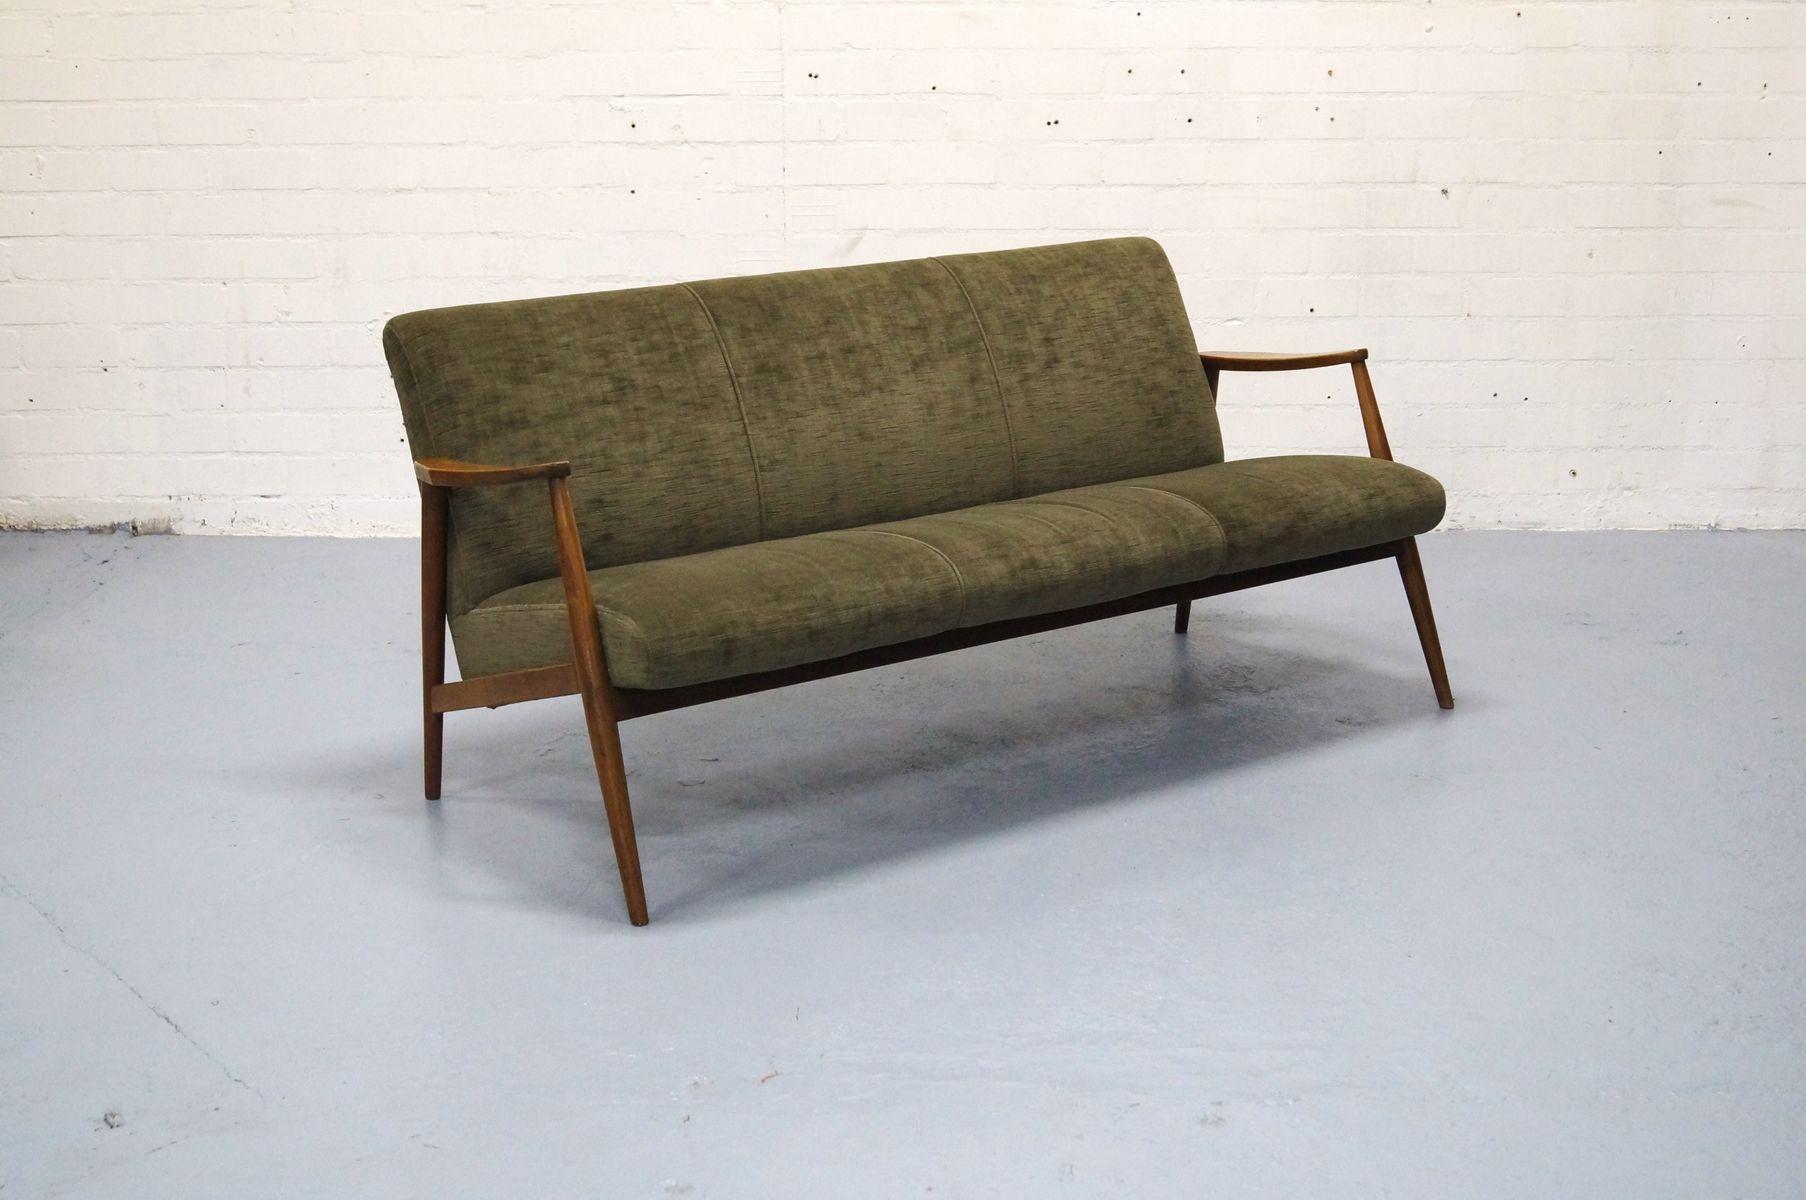 d nisches vintage sofa 1950er bei pamono kaufen. Black Bedroom Furniture Sets. Home Design Ideas